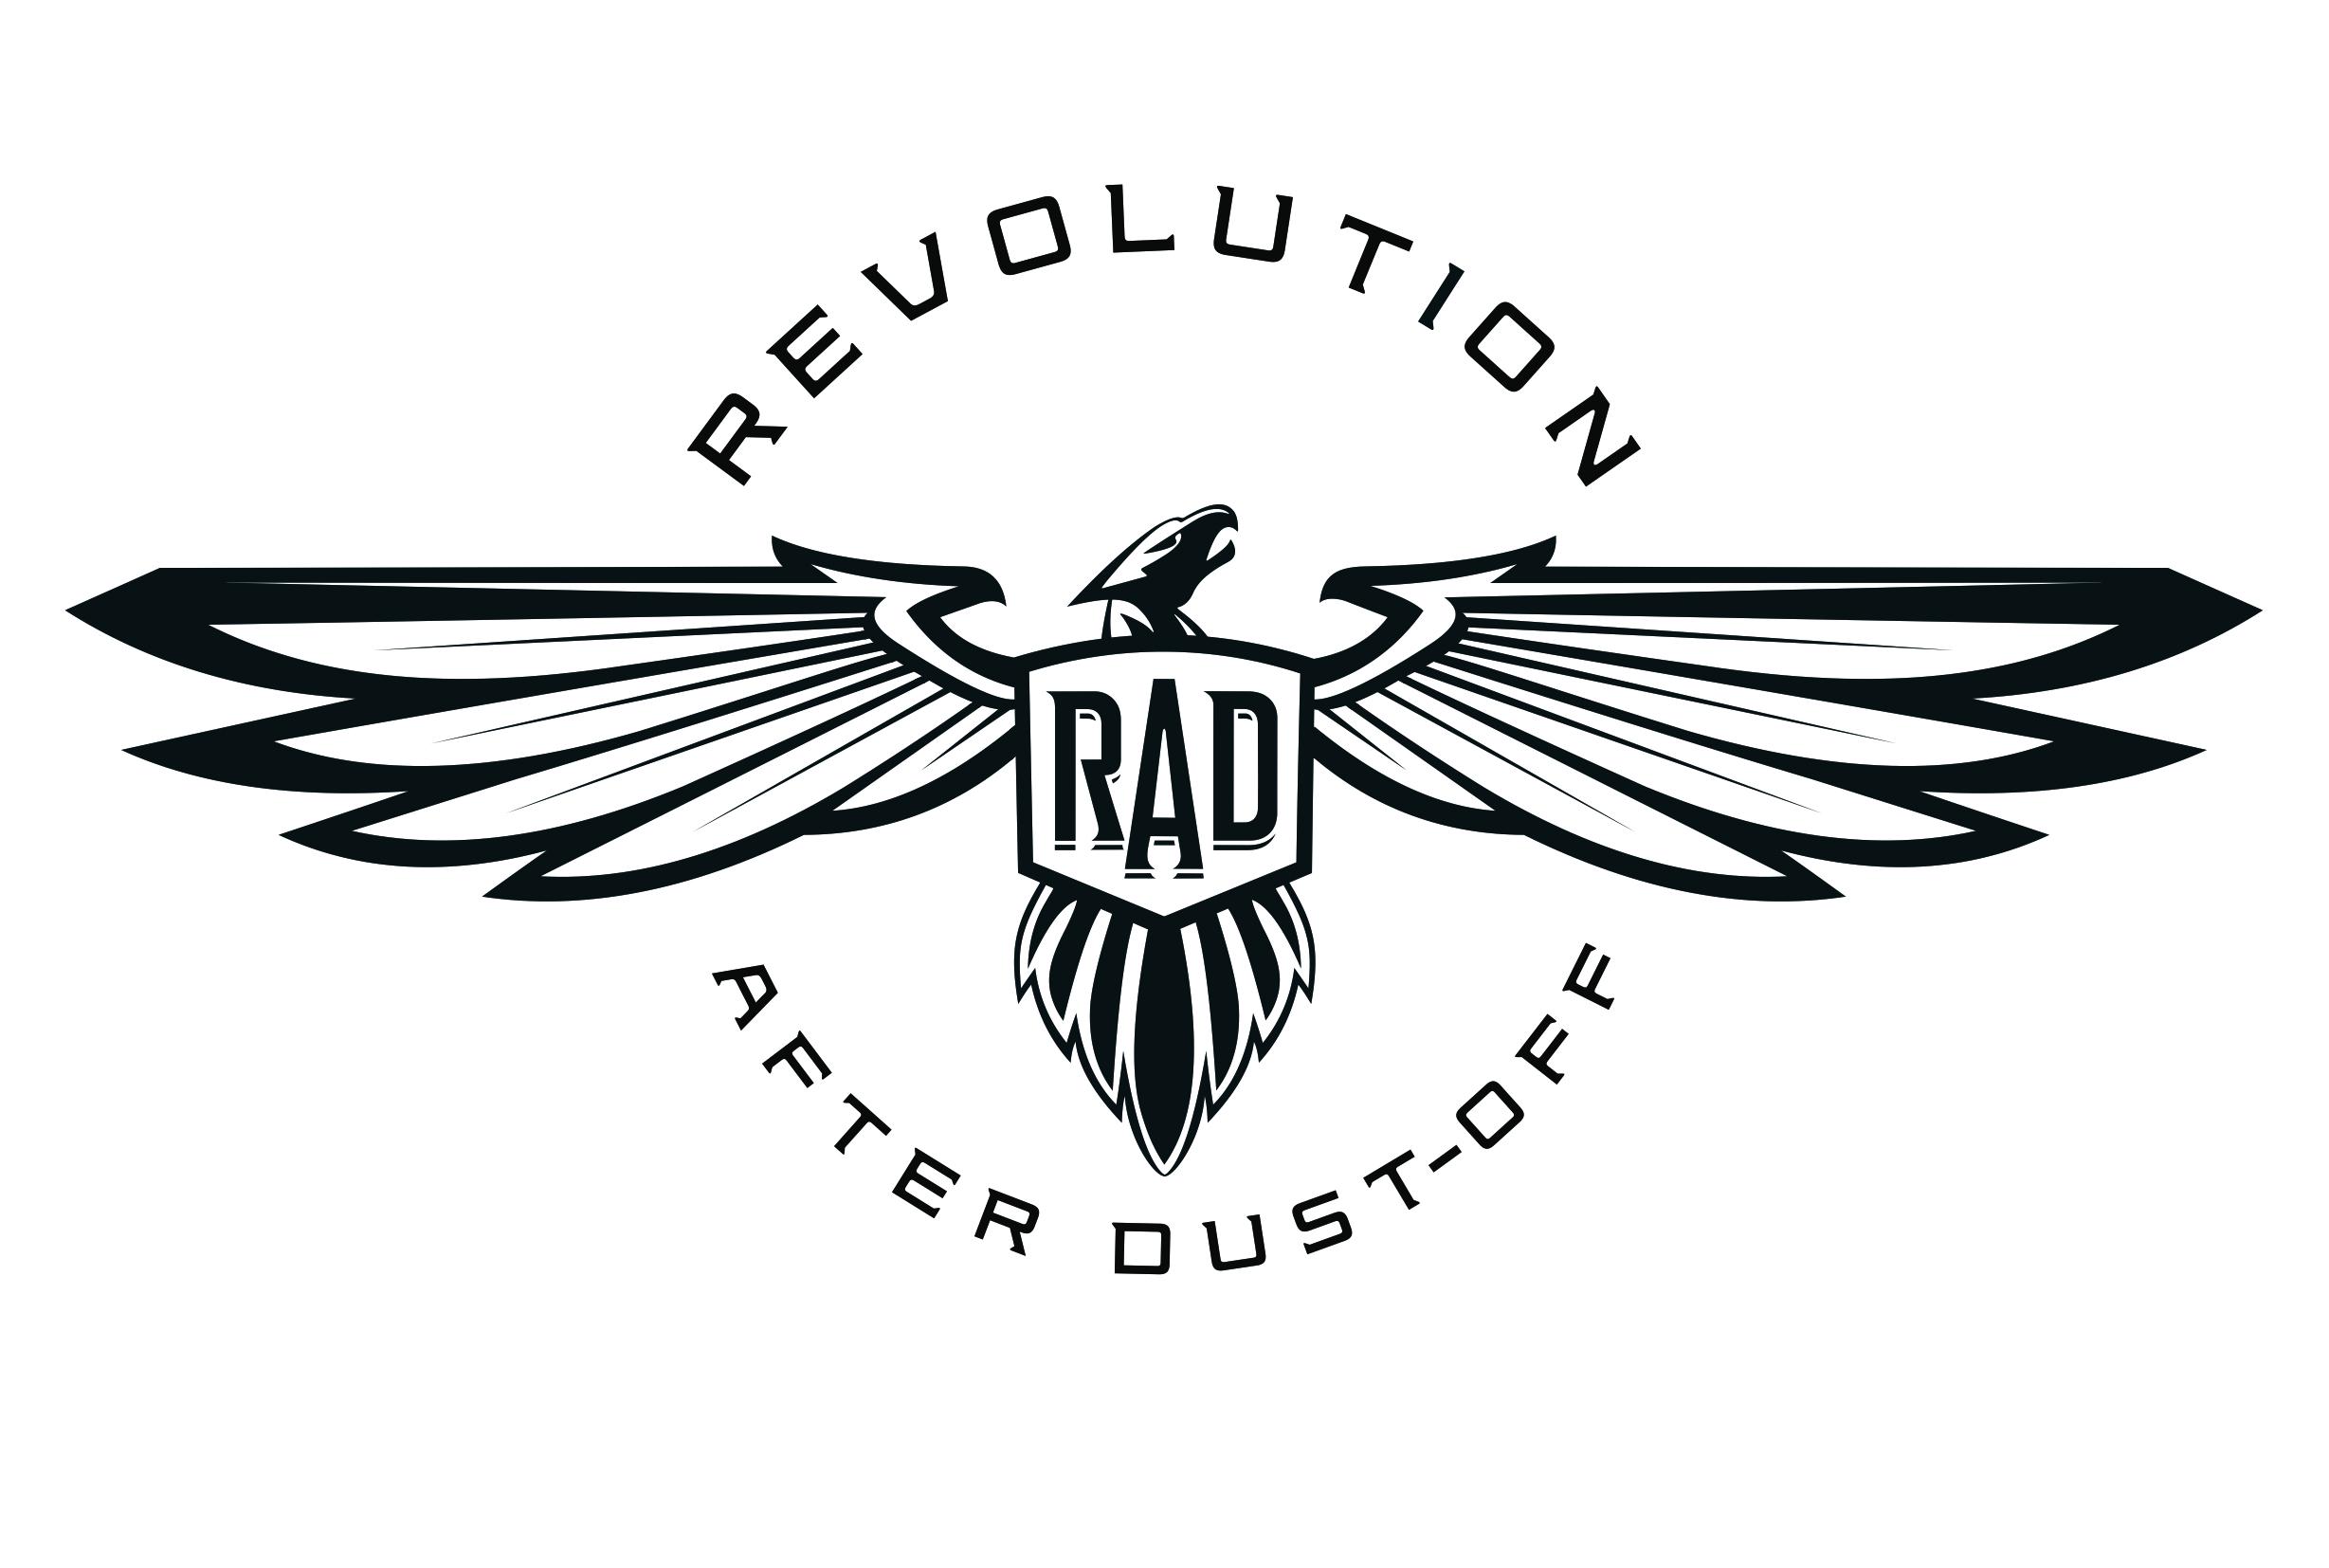 Revolution After Dust-off